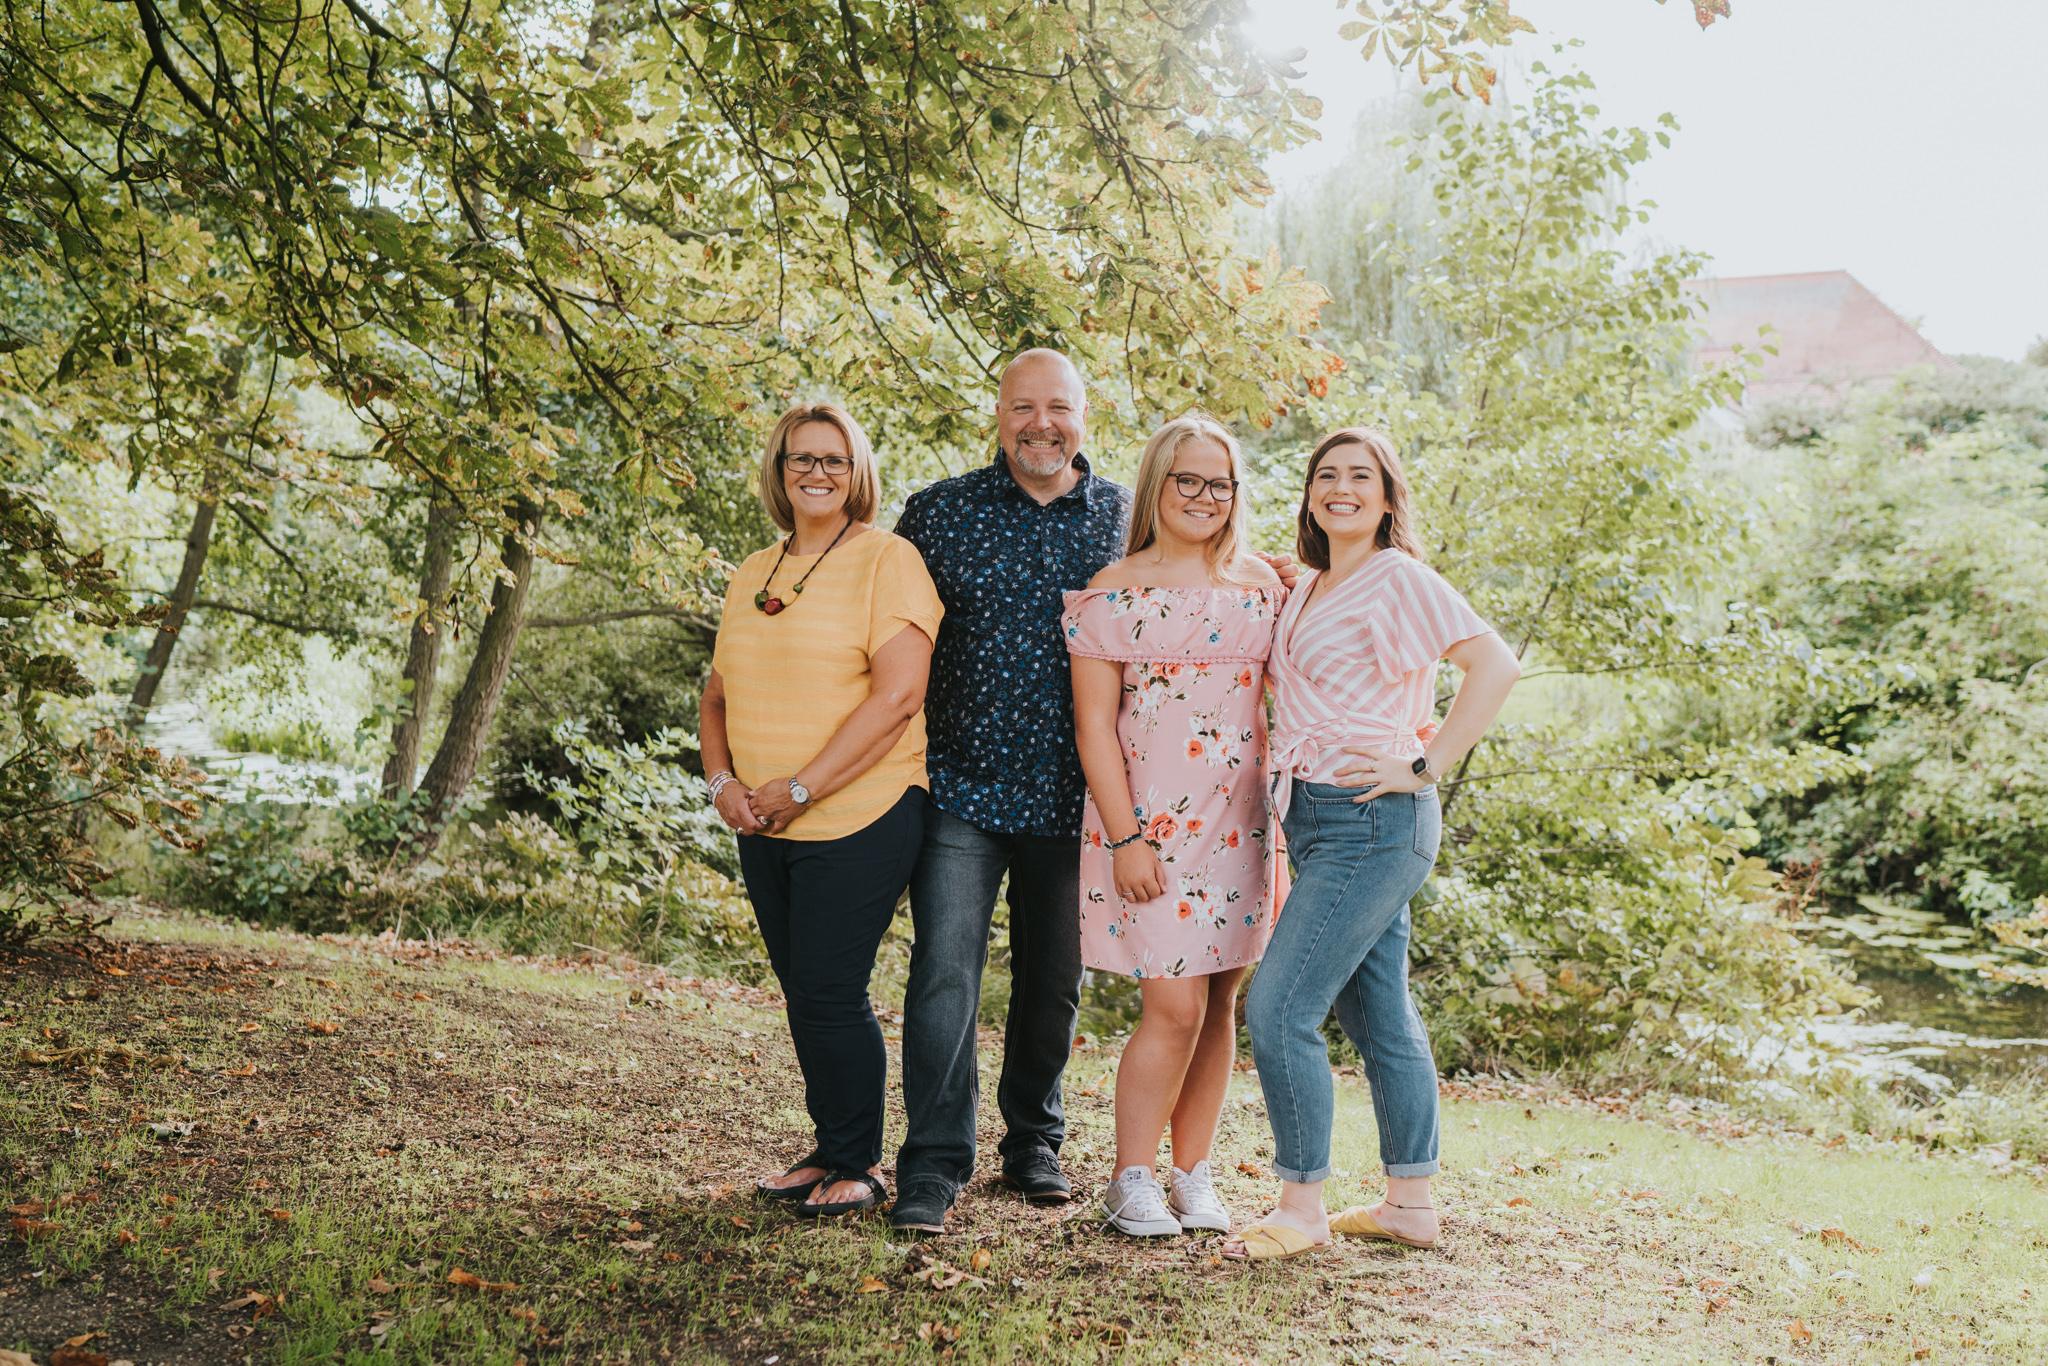 Fitch-Family-Colchester-Castle-Park-Grace-Elizabeth-Alternative-Wedding-Lifestyle-Photographer-Colchester-Essex-Suffolk-Norfolk-Devon (14 of 41).jpg